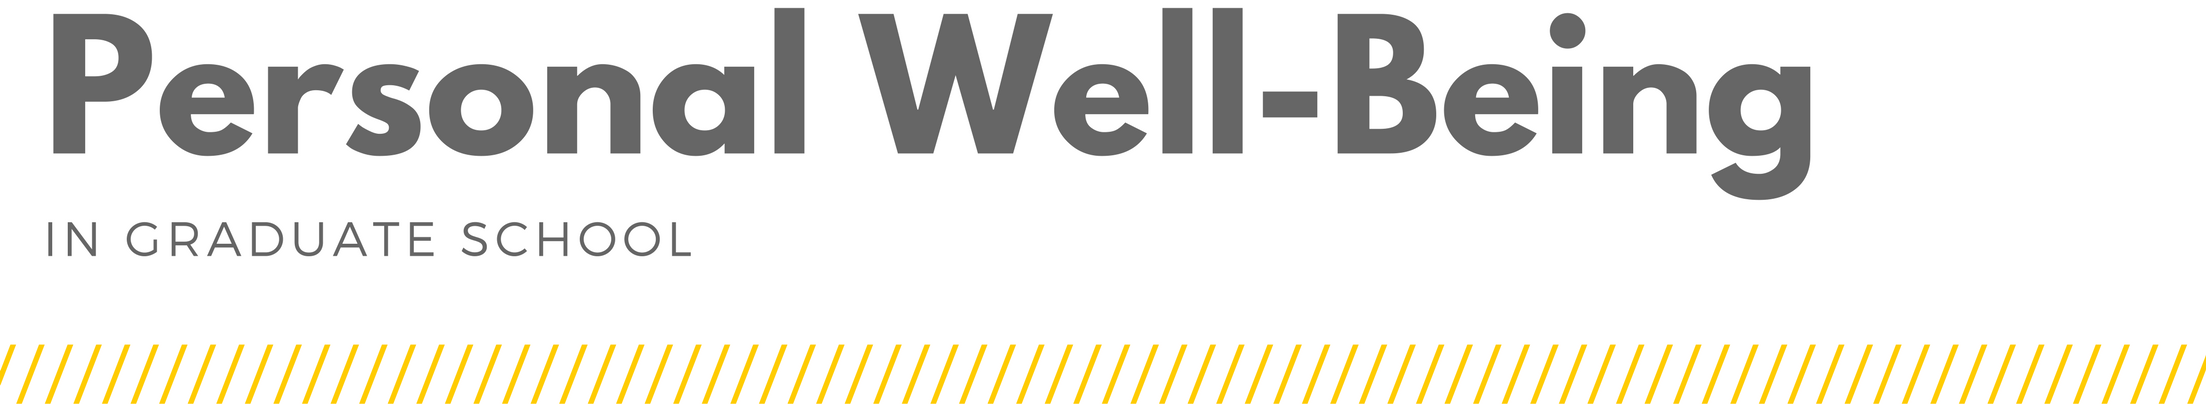 Personal Well-Being in Graduate School